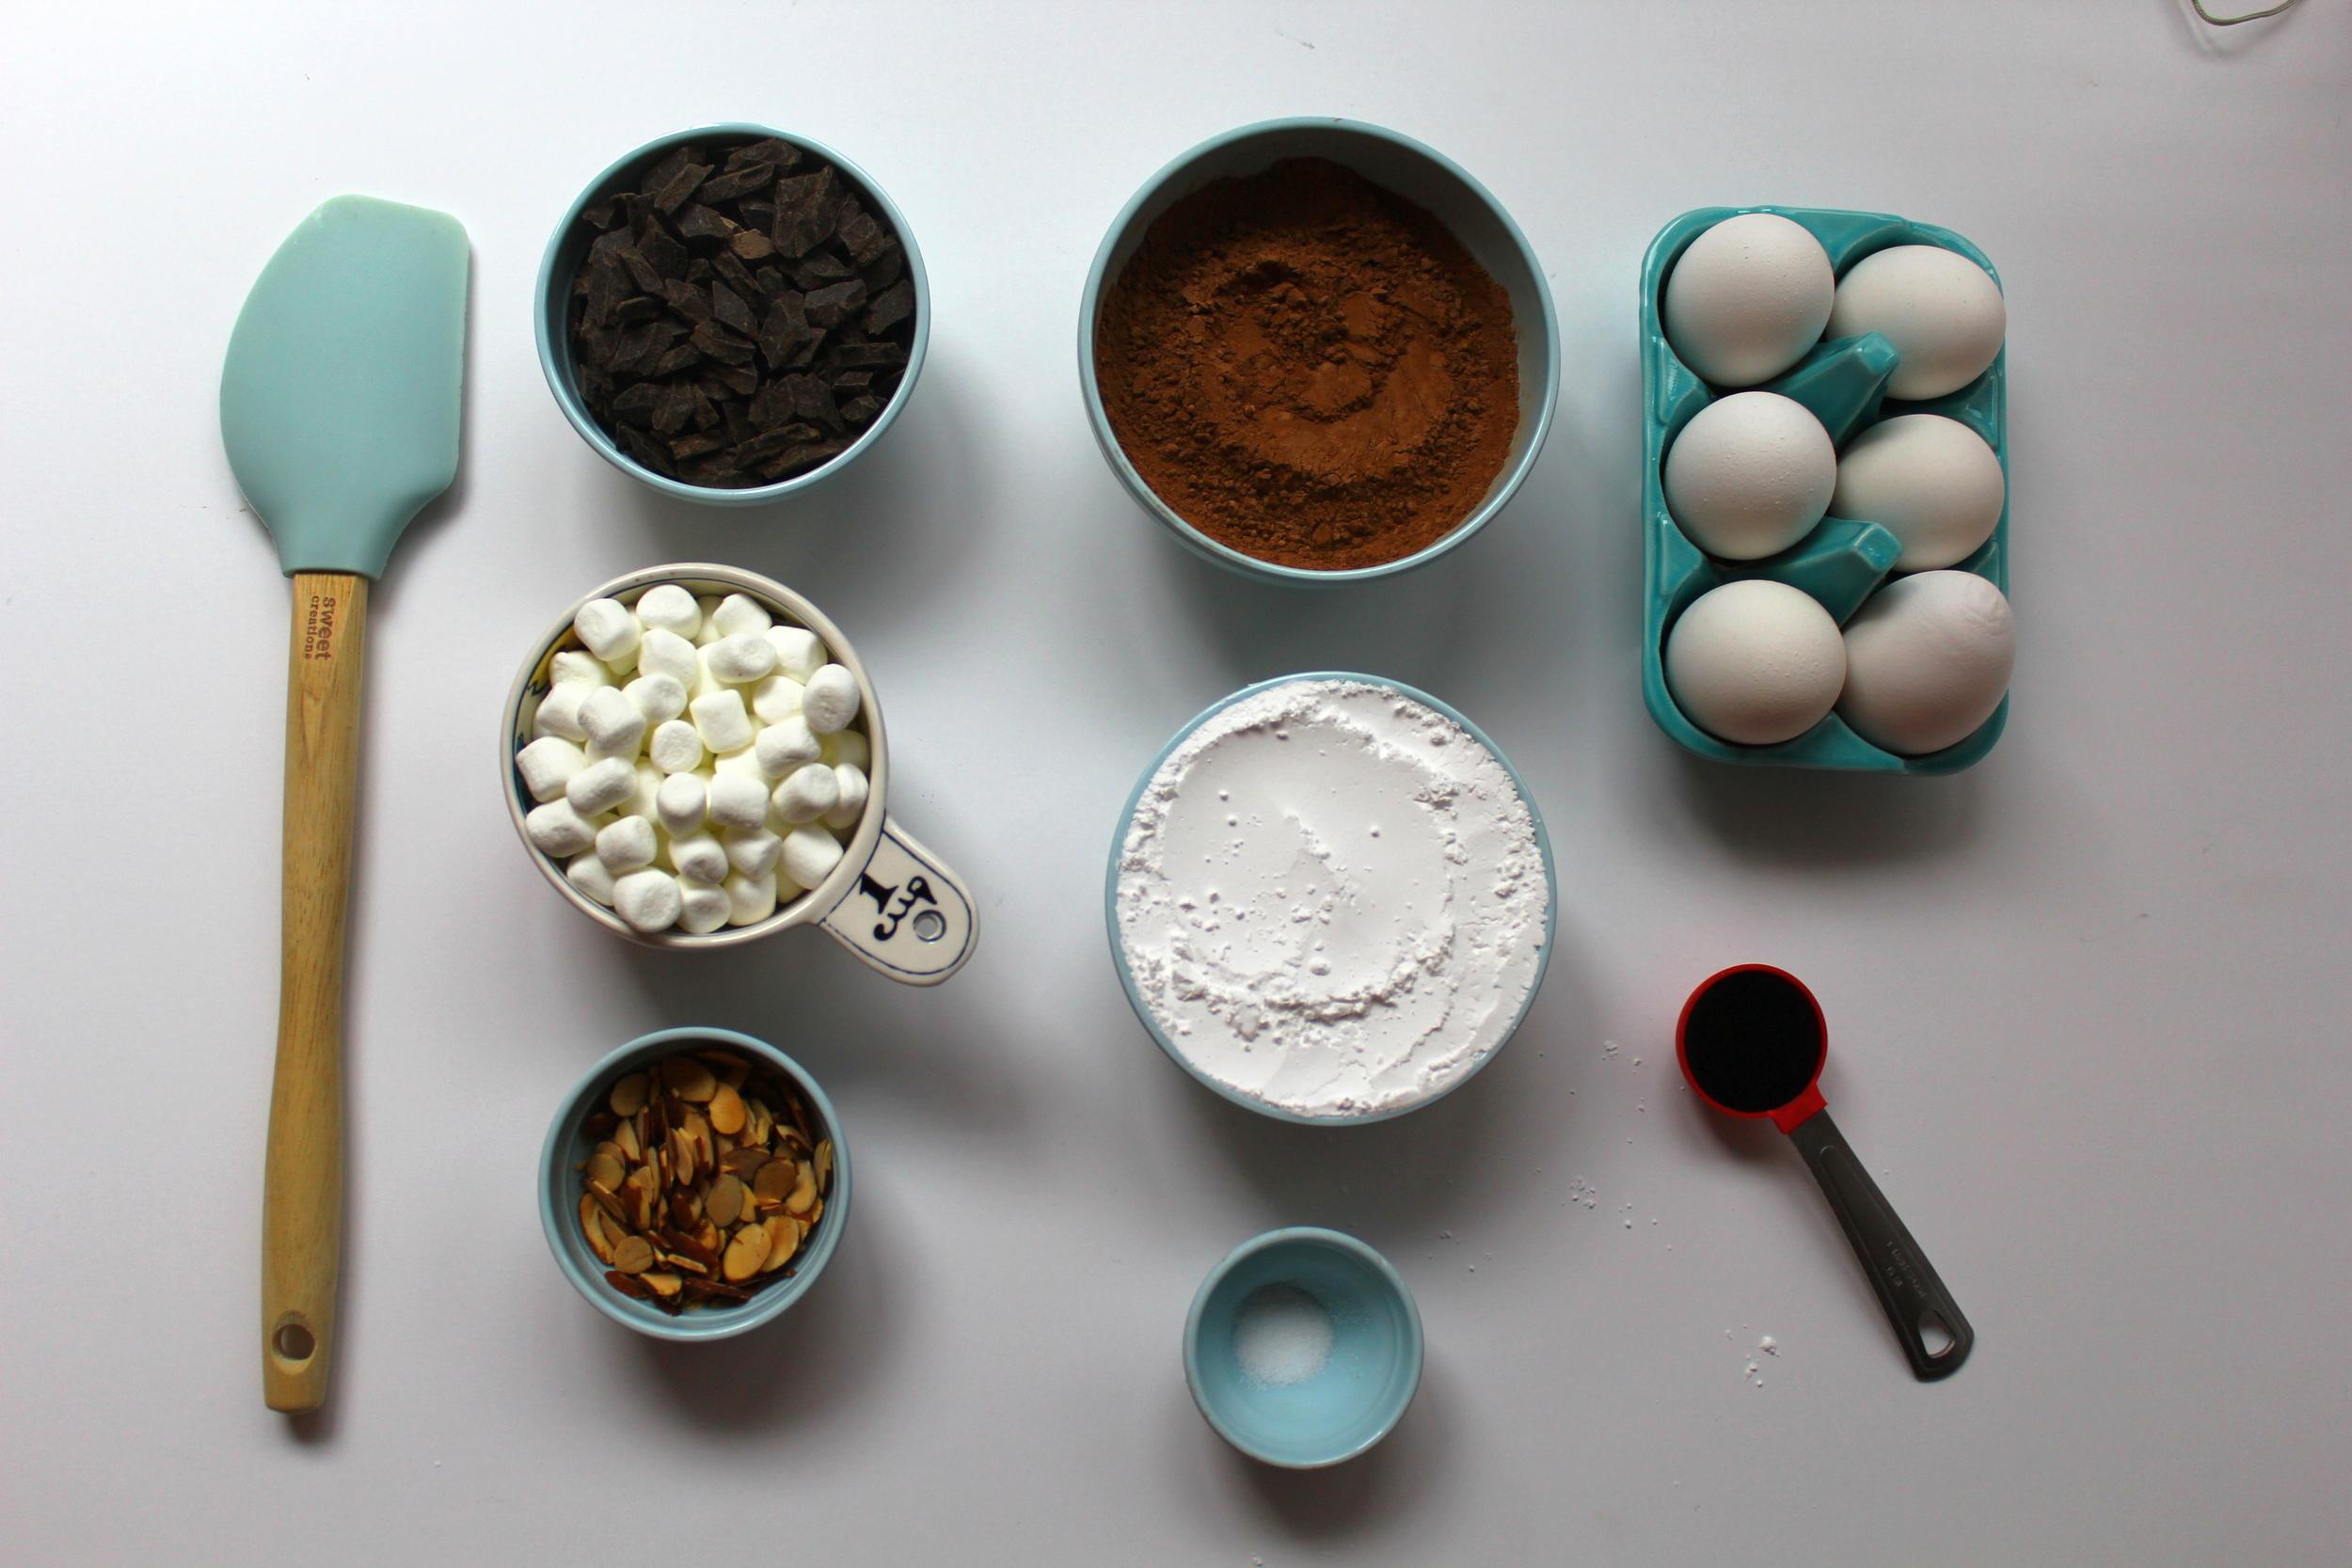 flourless rocky road cookies ingredients